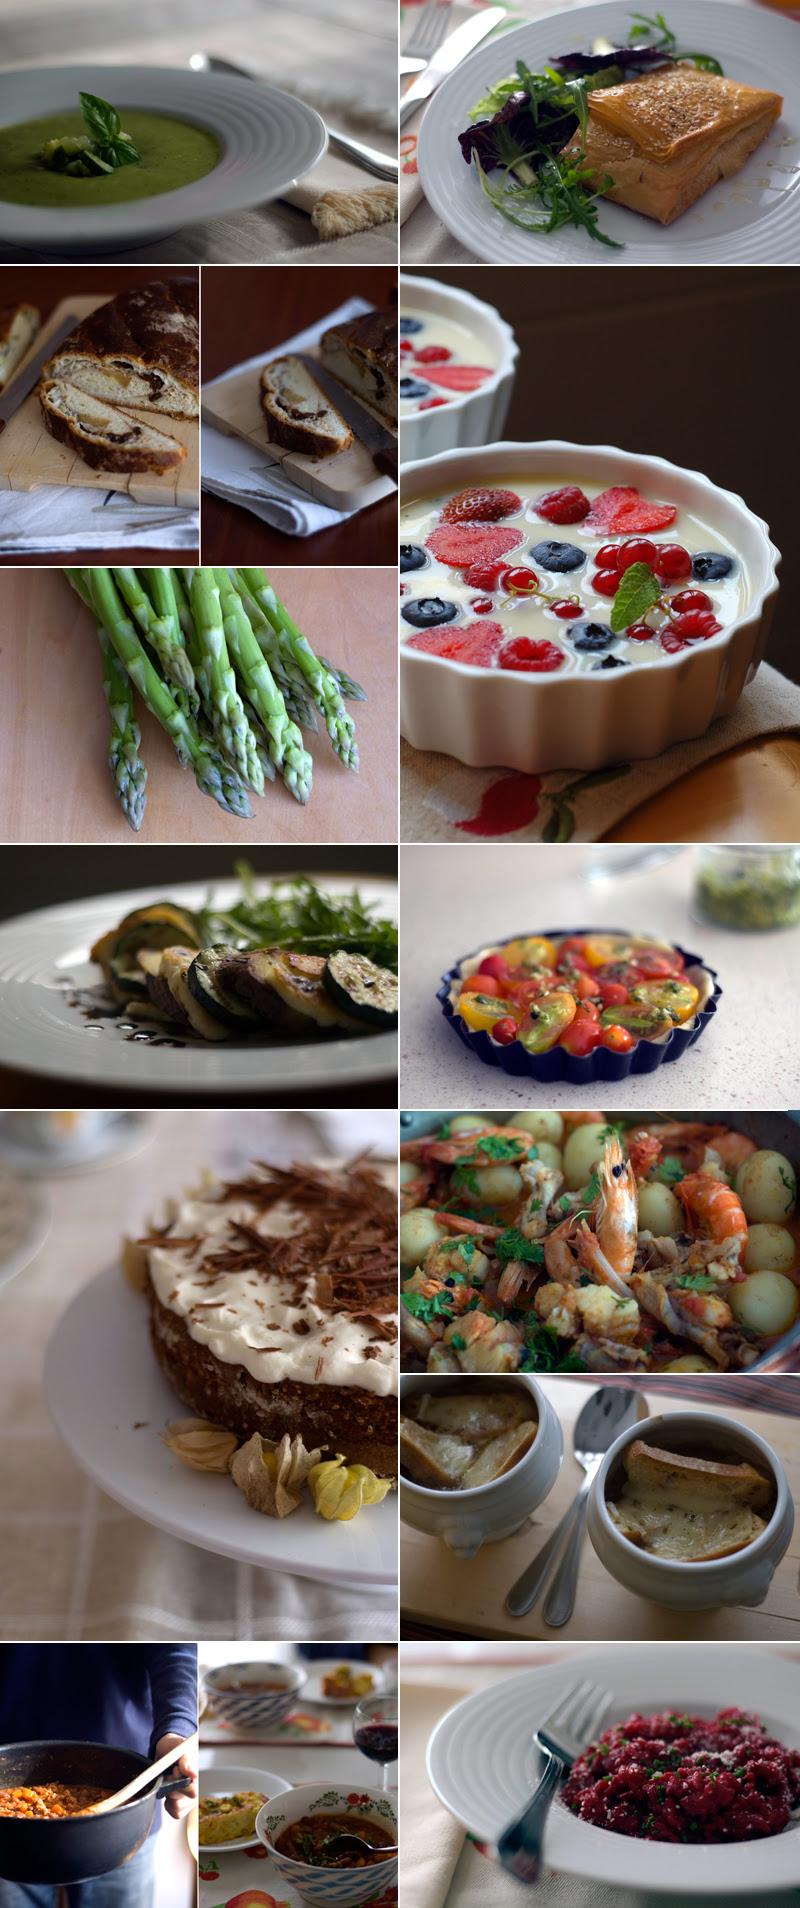 2011 em imagens // What we ate in 2011